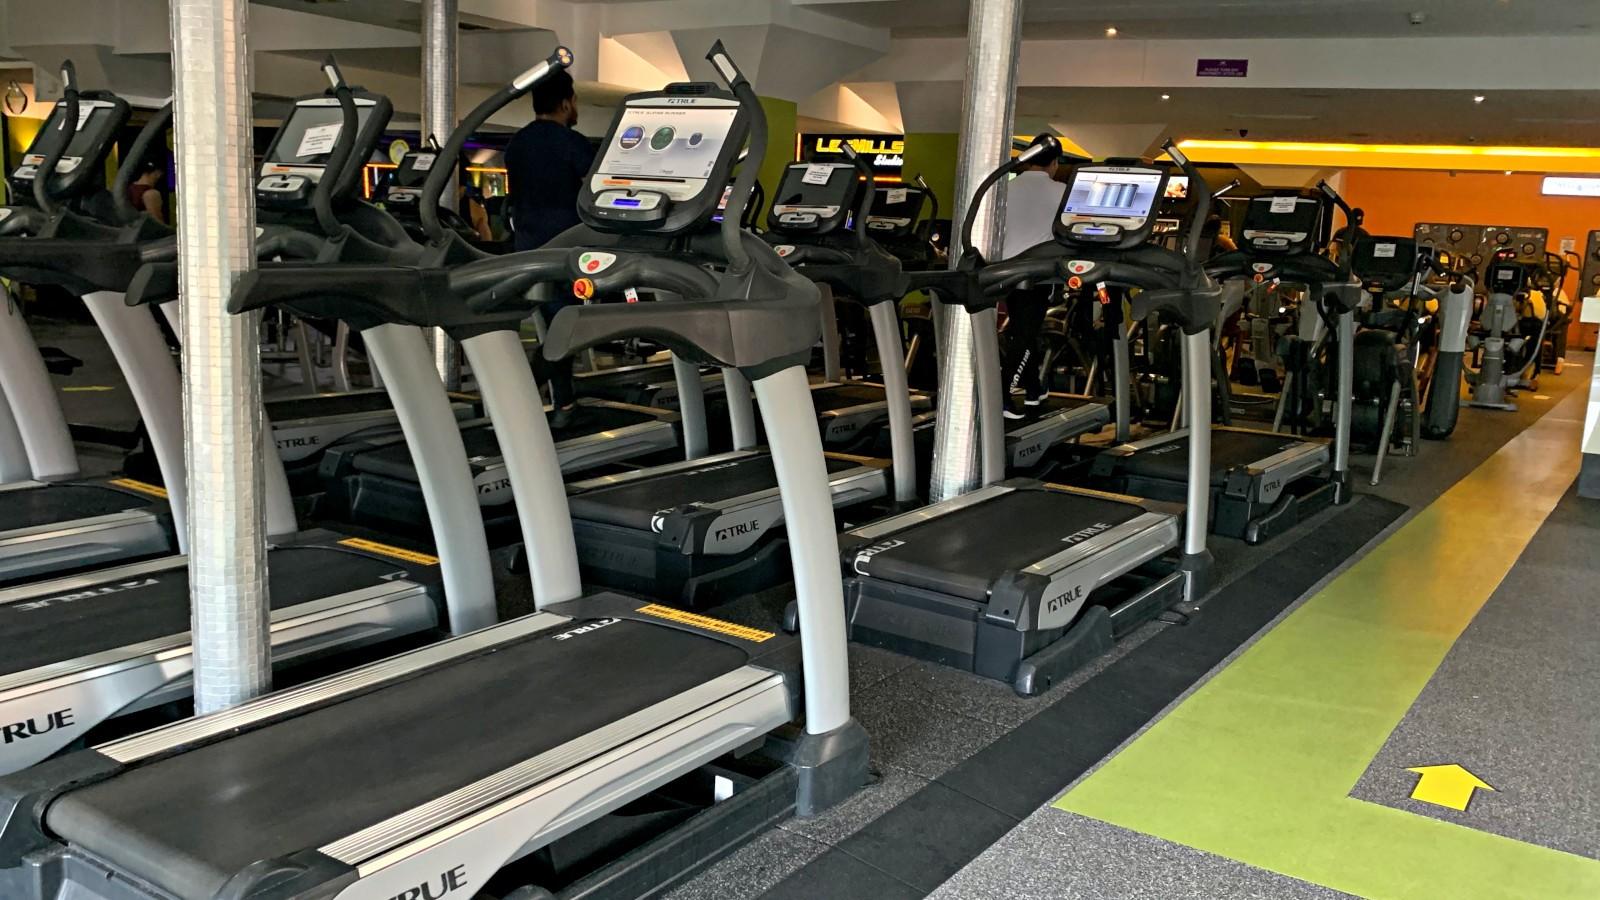 a row of true fitness treadmil machines